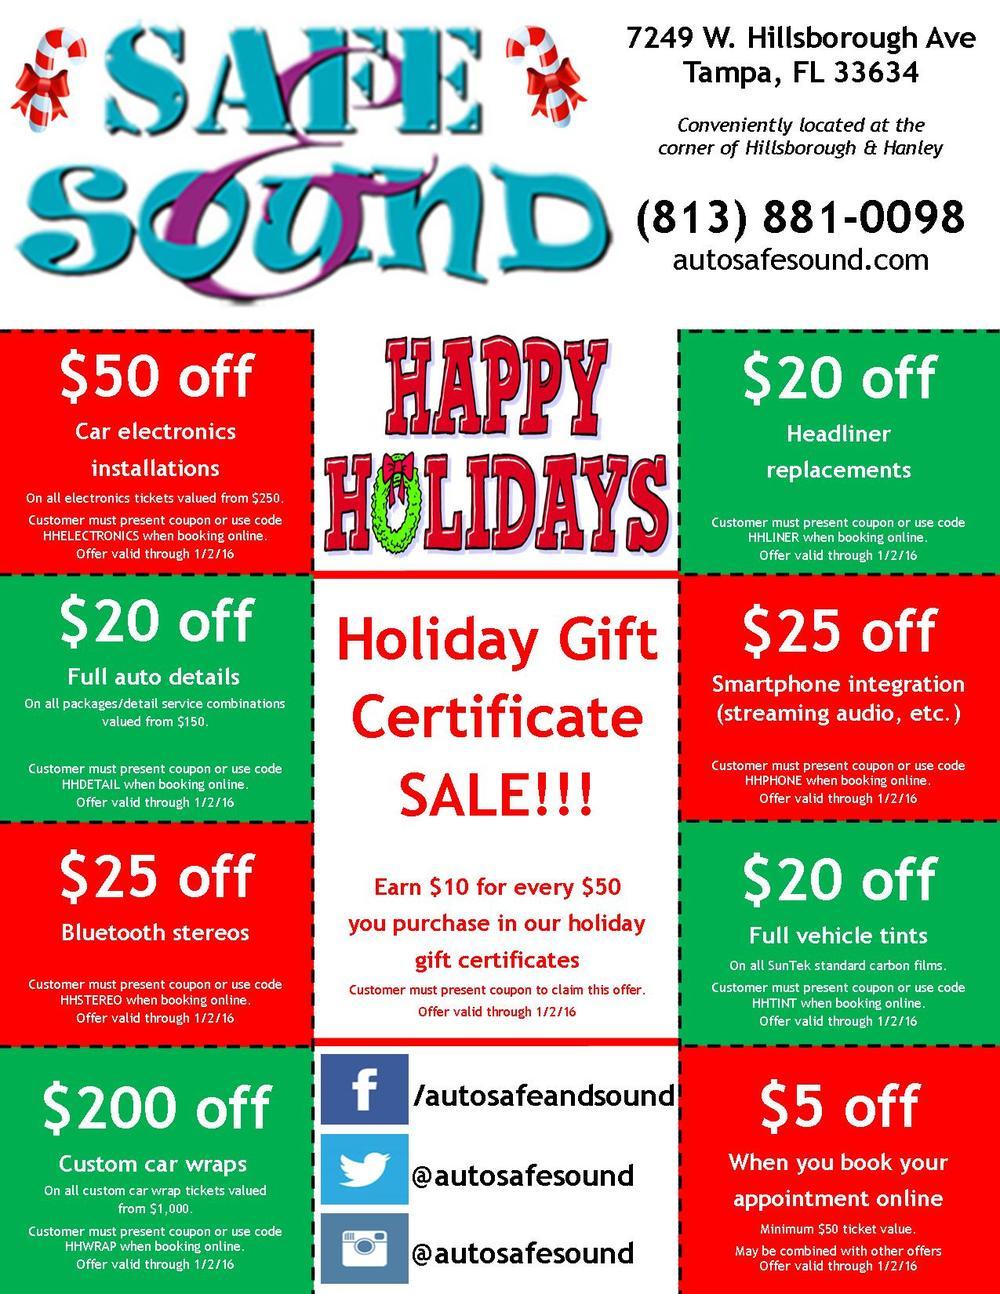 2015-holiday-season-christmas-coupons-deals-and-savings-at-auto-safe-sound.jpg